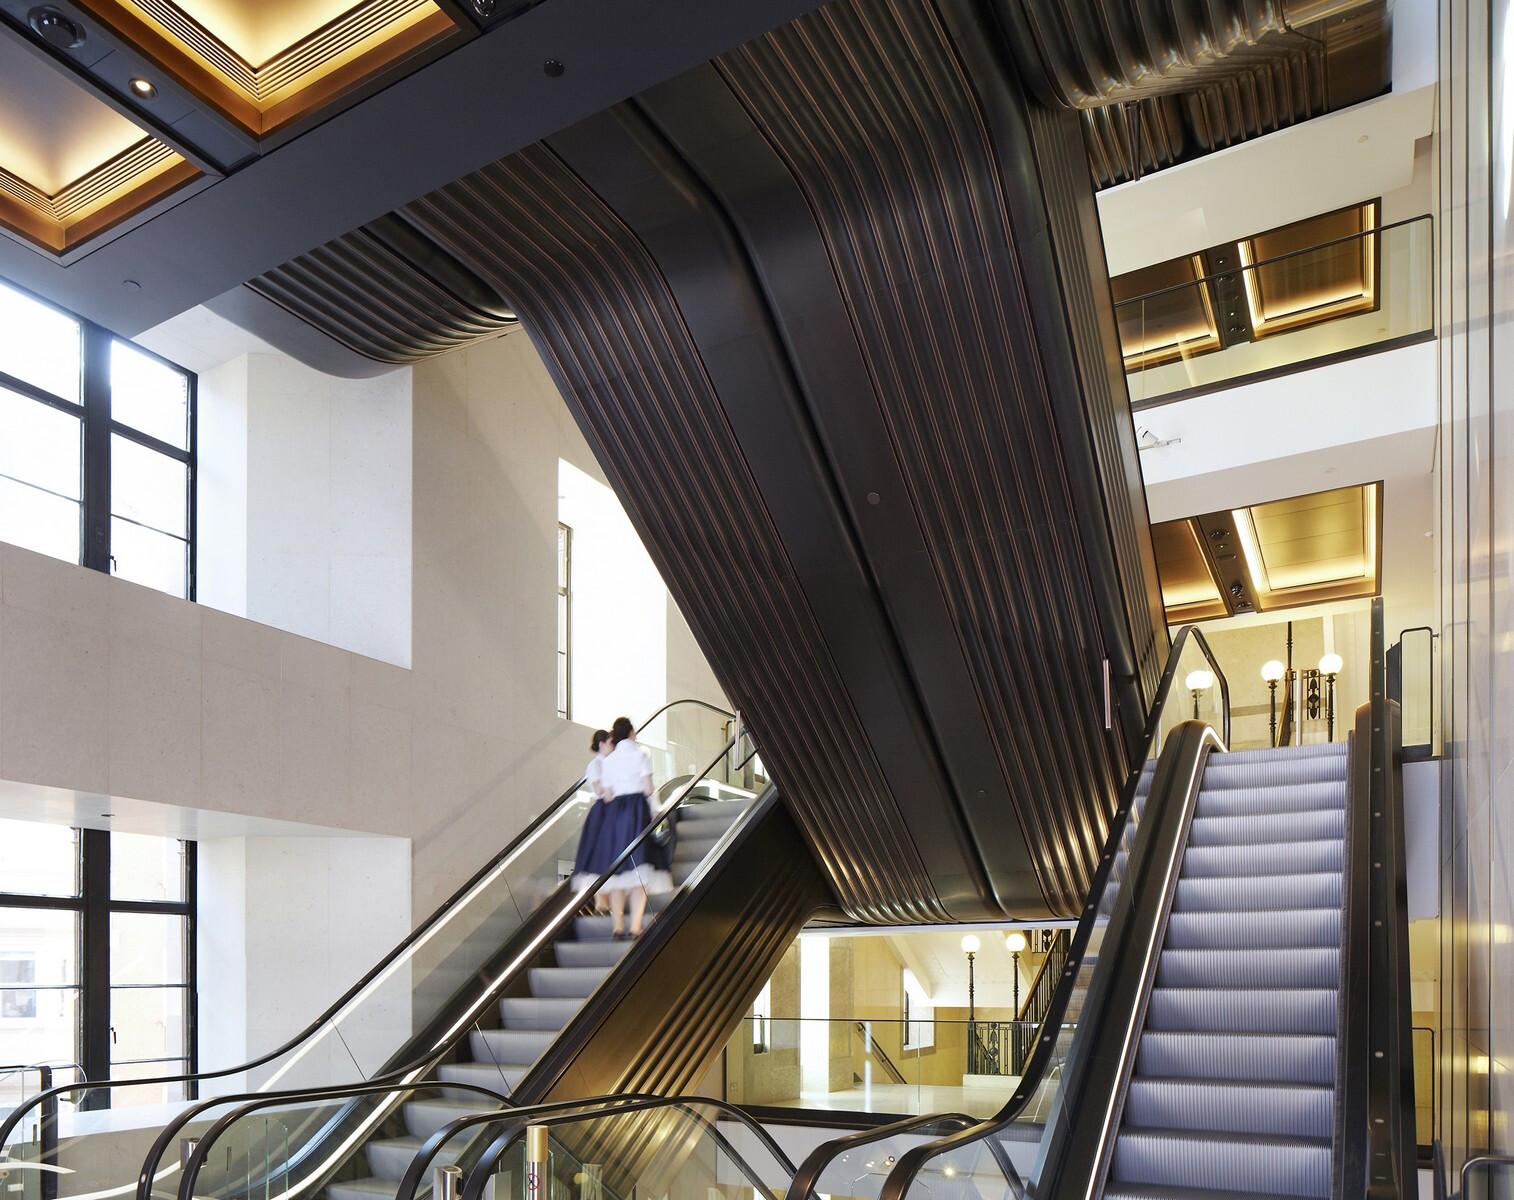 Harrods Escalator Hall 3